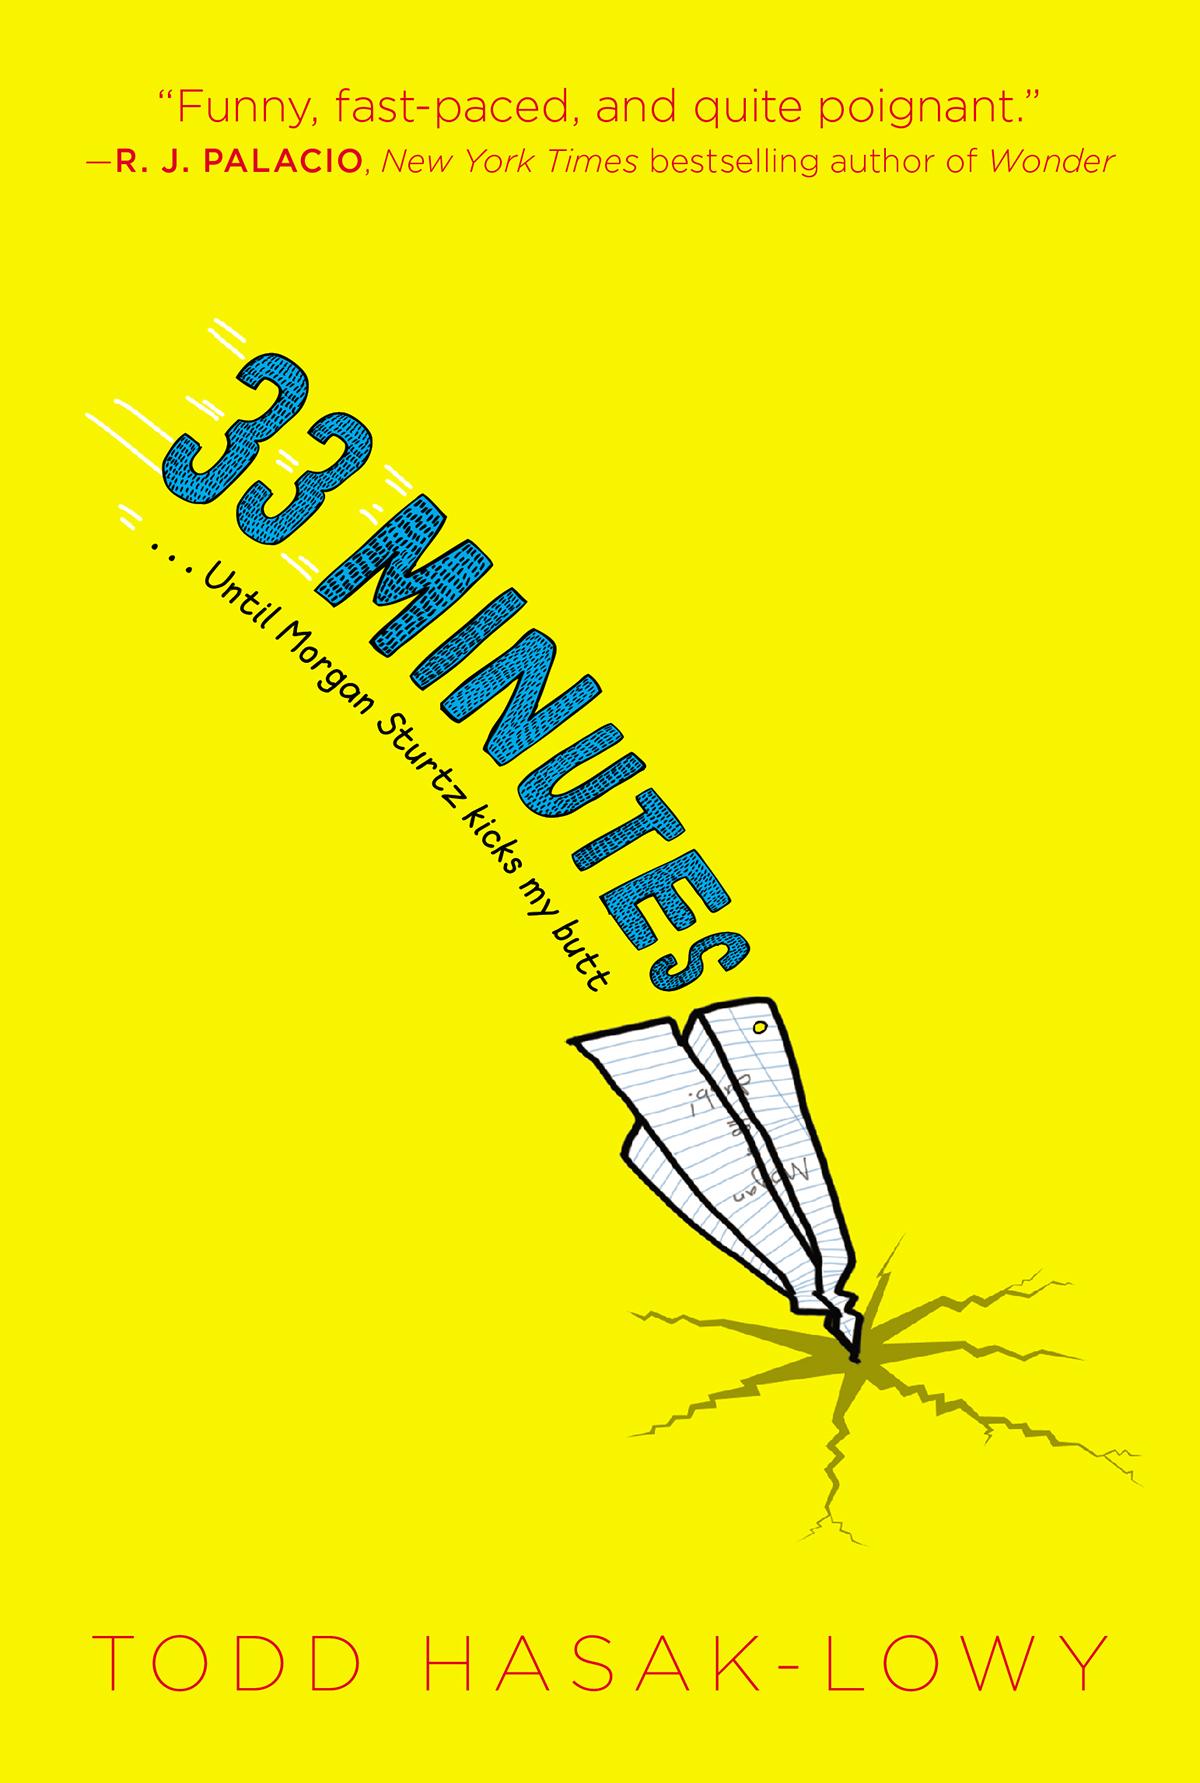 33 Minutes ...Until Morgan Sturtz Kicks My Butt book cover